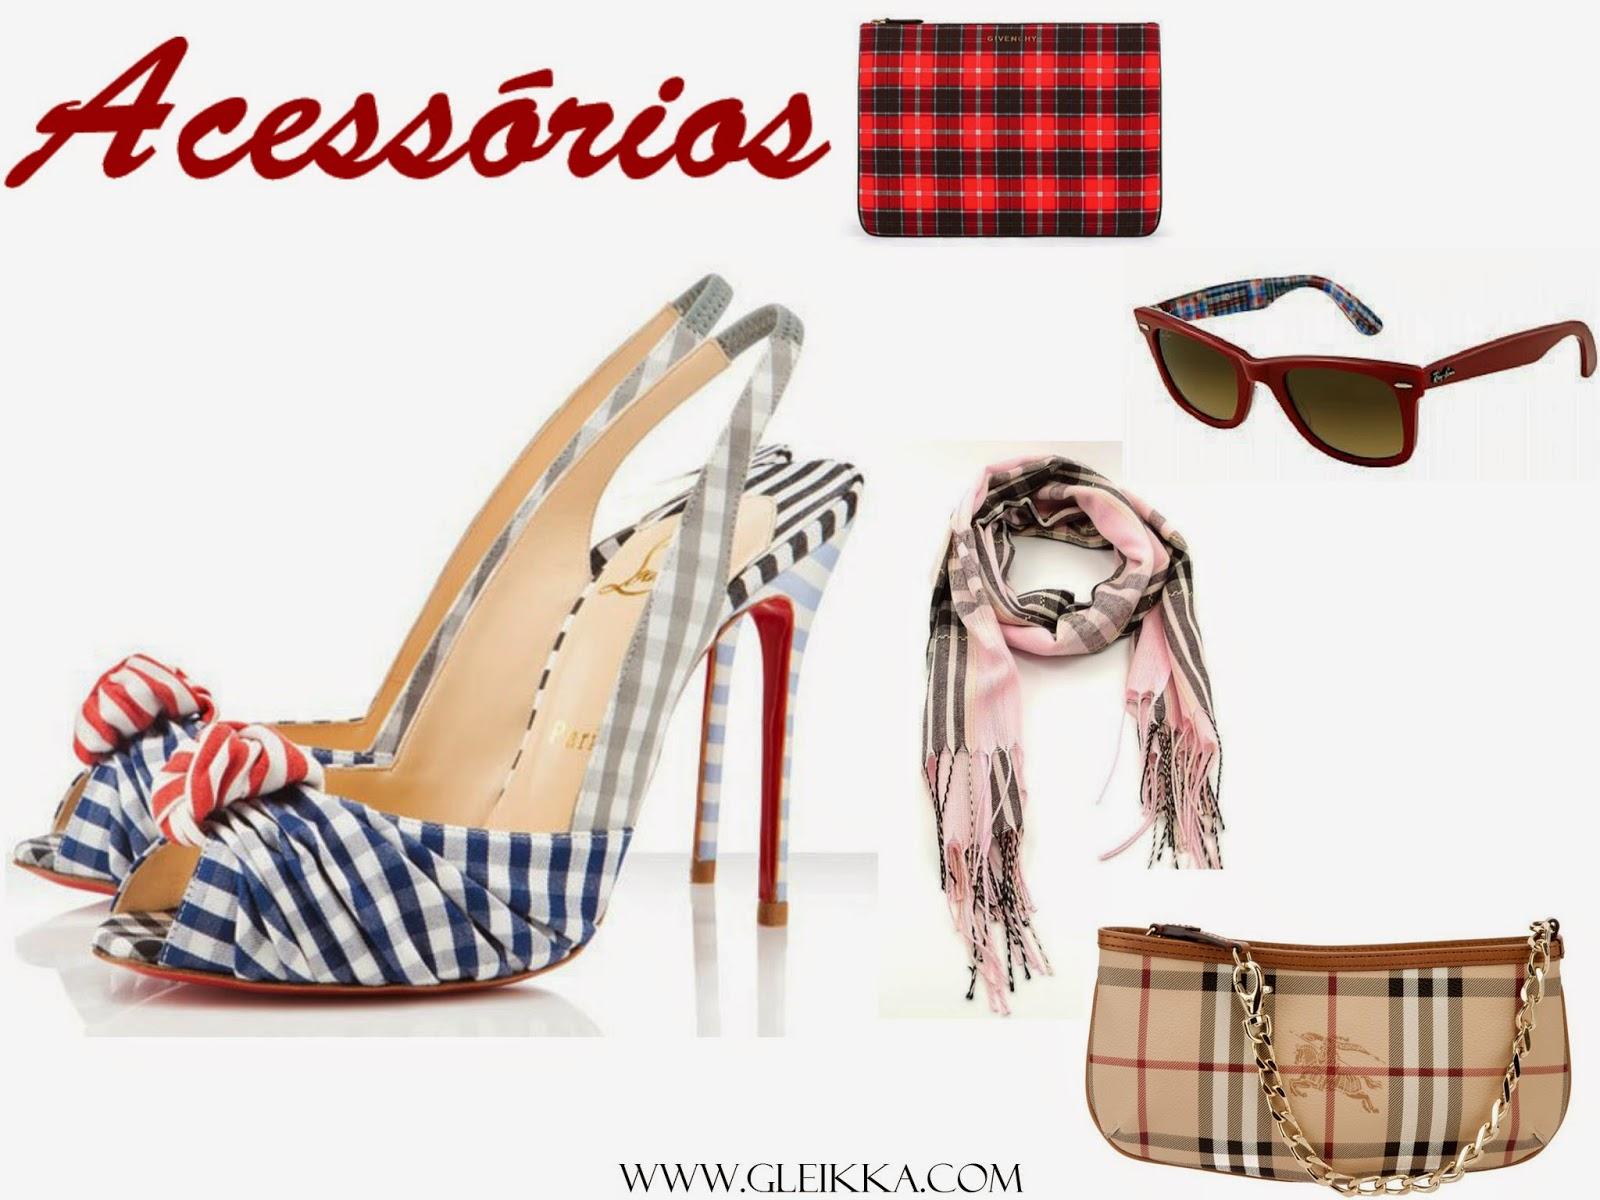 Blog Gleikka, Tendência 2014, Xadrez, Inspiração, Xadrez elegante, Saias xadrez, xadrez chic, look, look feminino, Outono inverno, acessórios xadrez